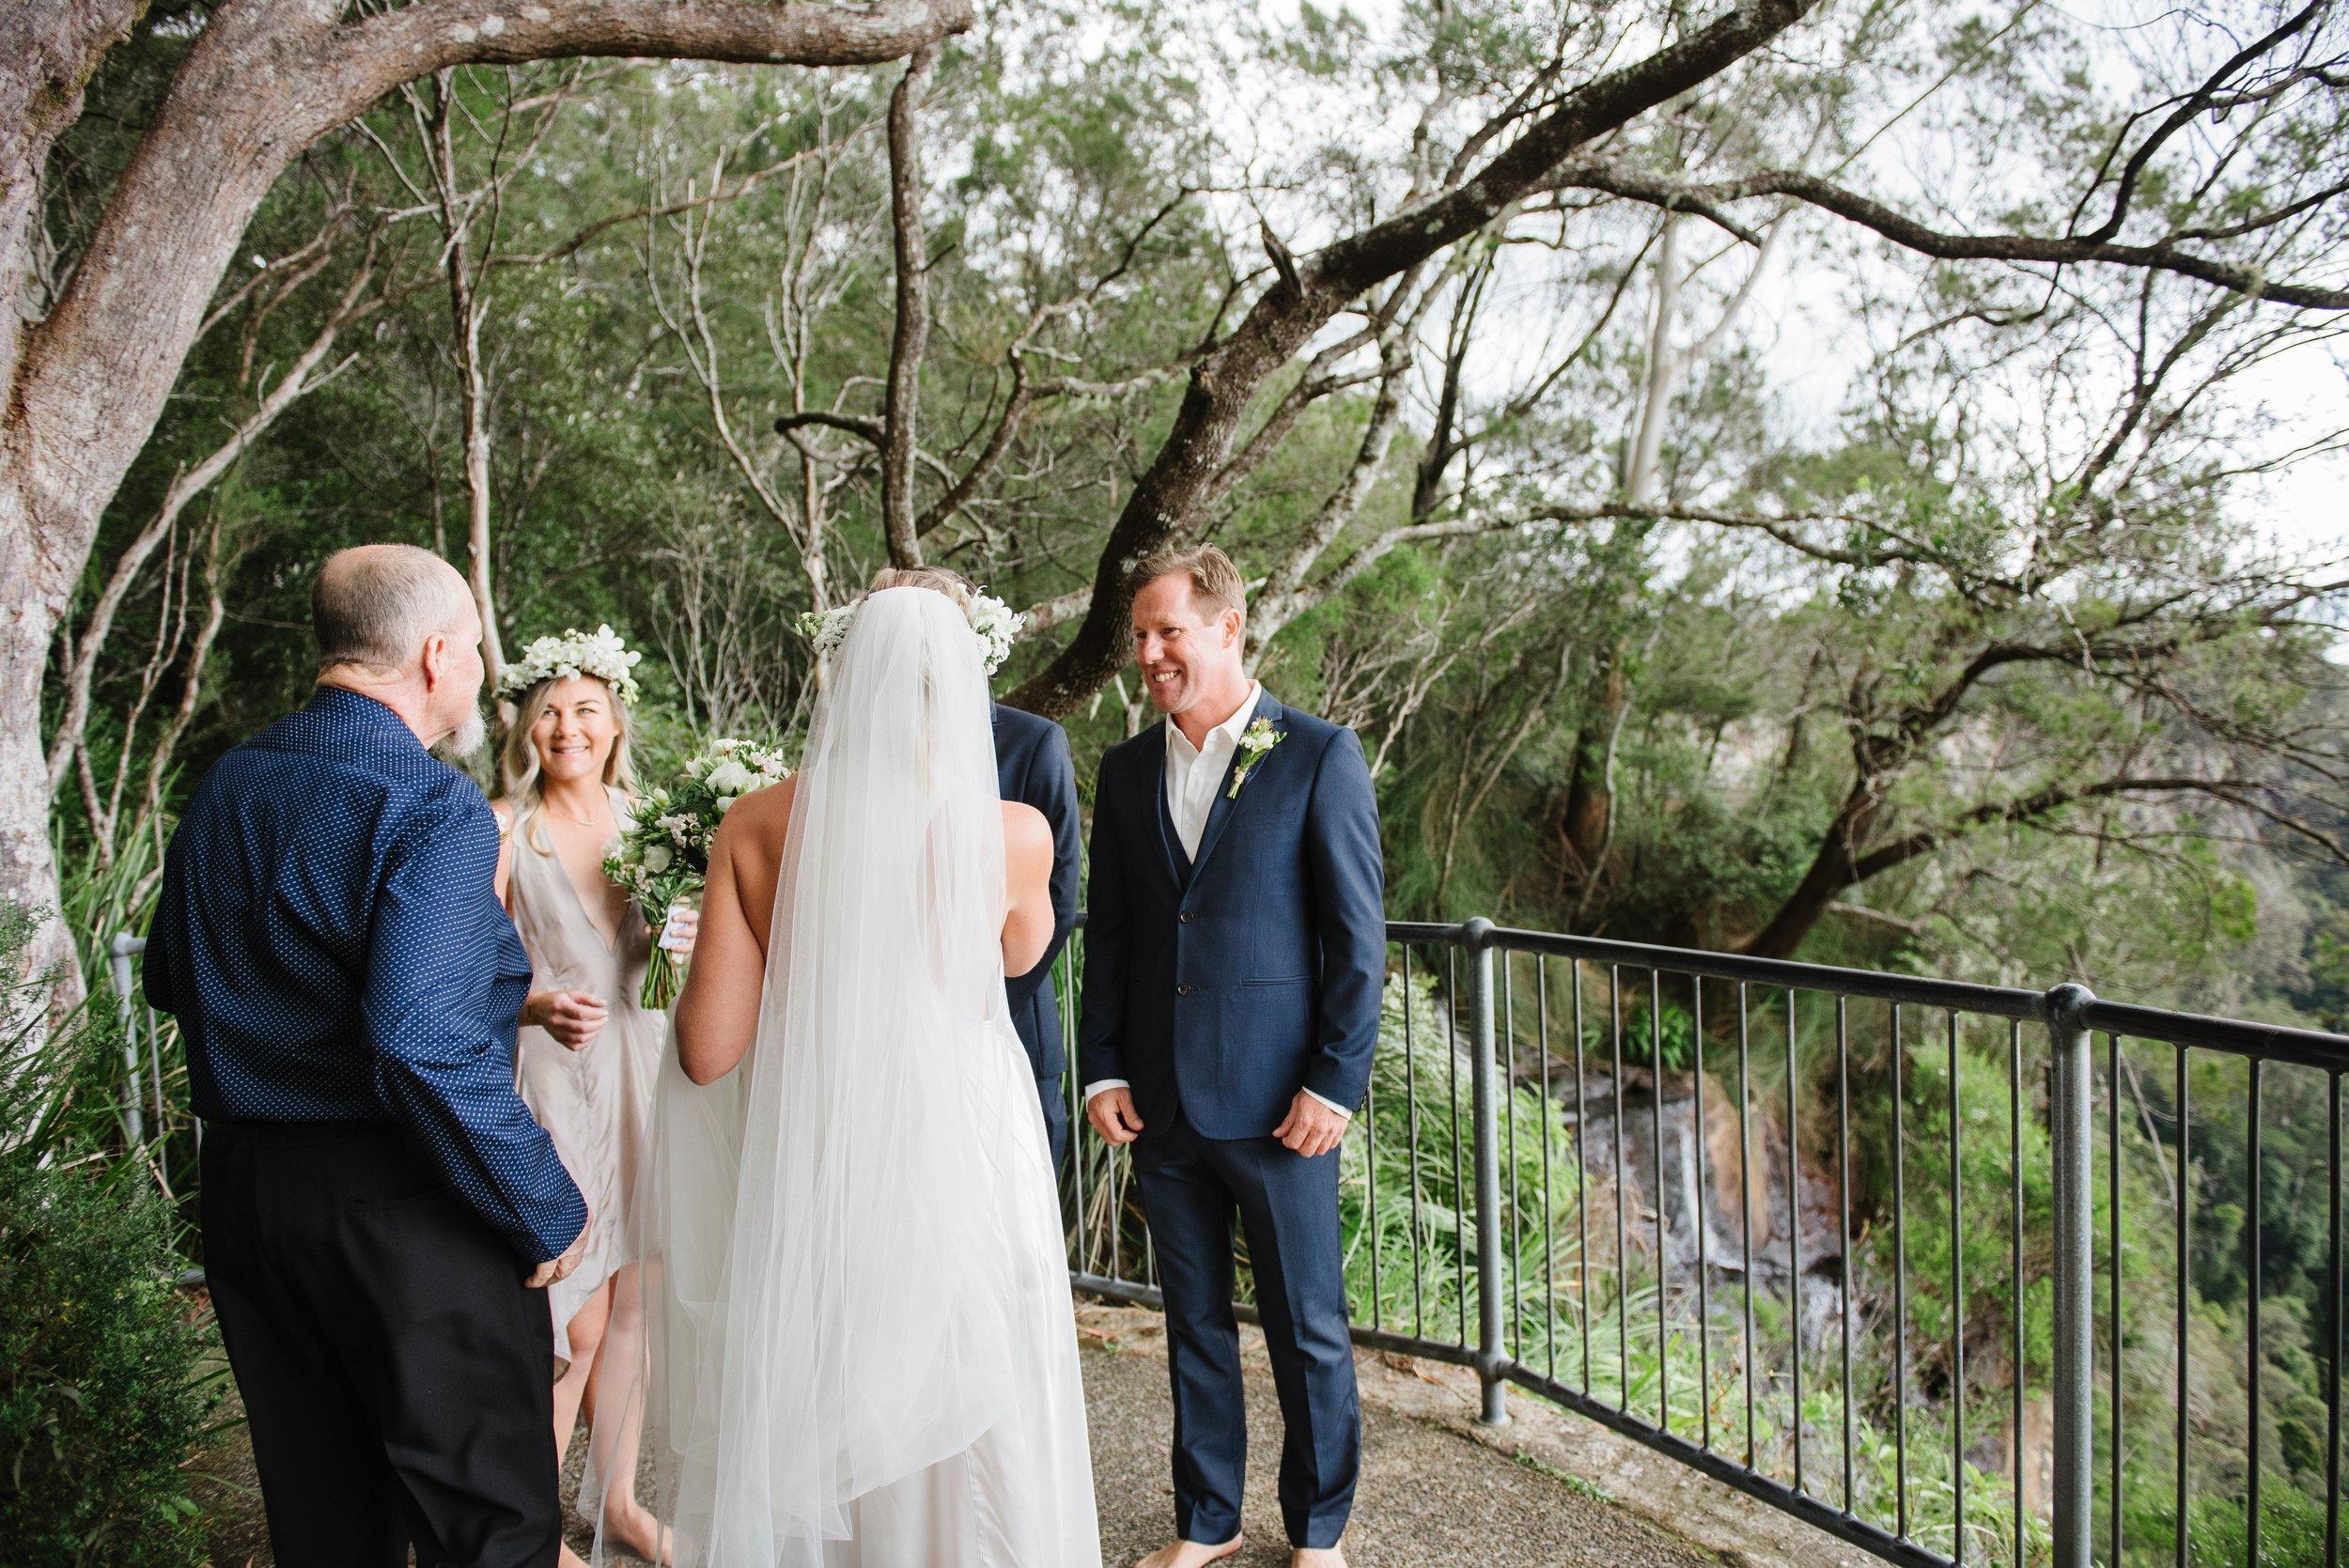 Carla and Luke- wedding photographer, byron bay wedding and family photographer, tweed heads wedding and family photography-156.jpg